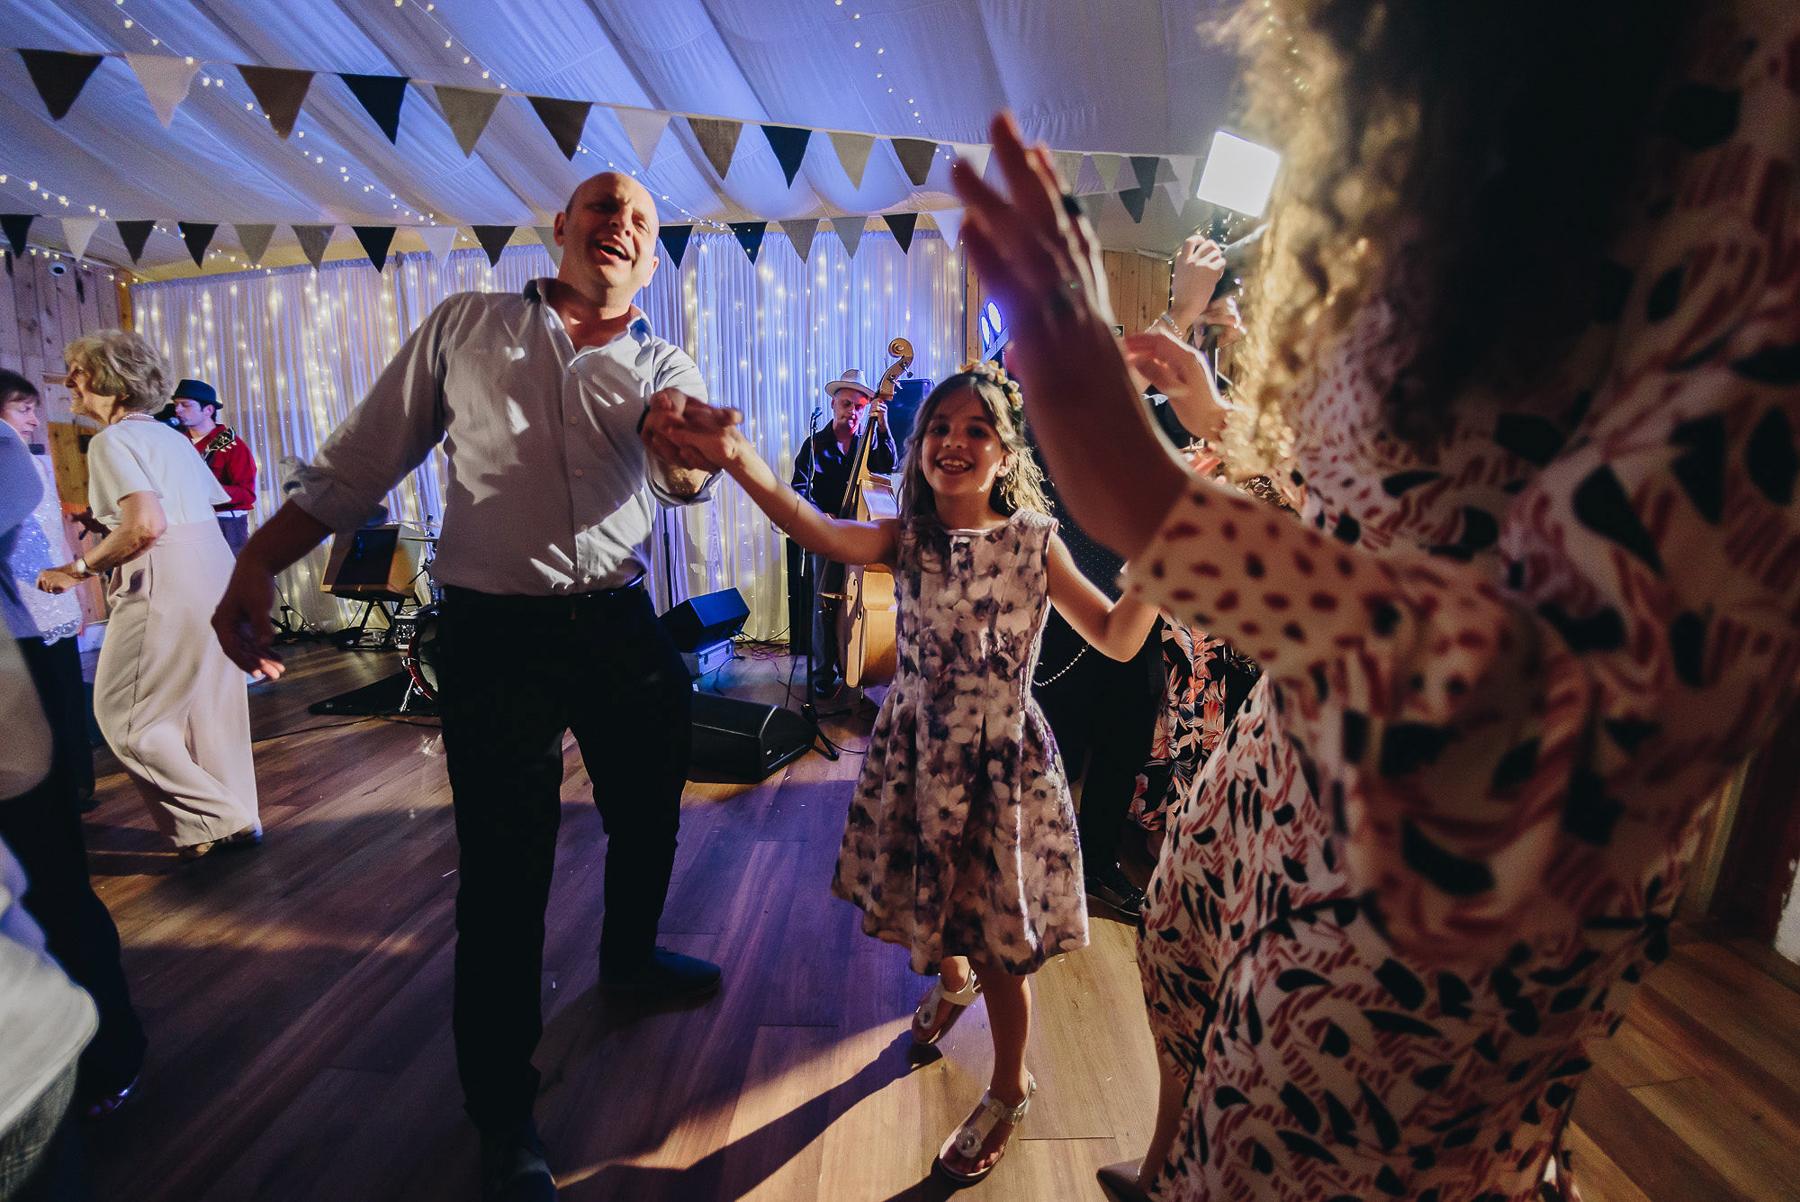 Wellbeing_Farm_Wedding_Photography_The_Pin-Up_Bride_Lara_Shaun-160.jpg